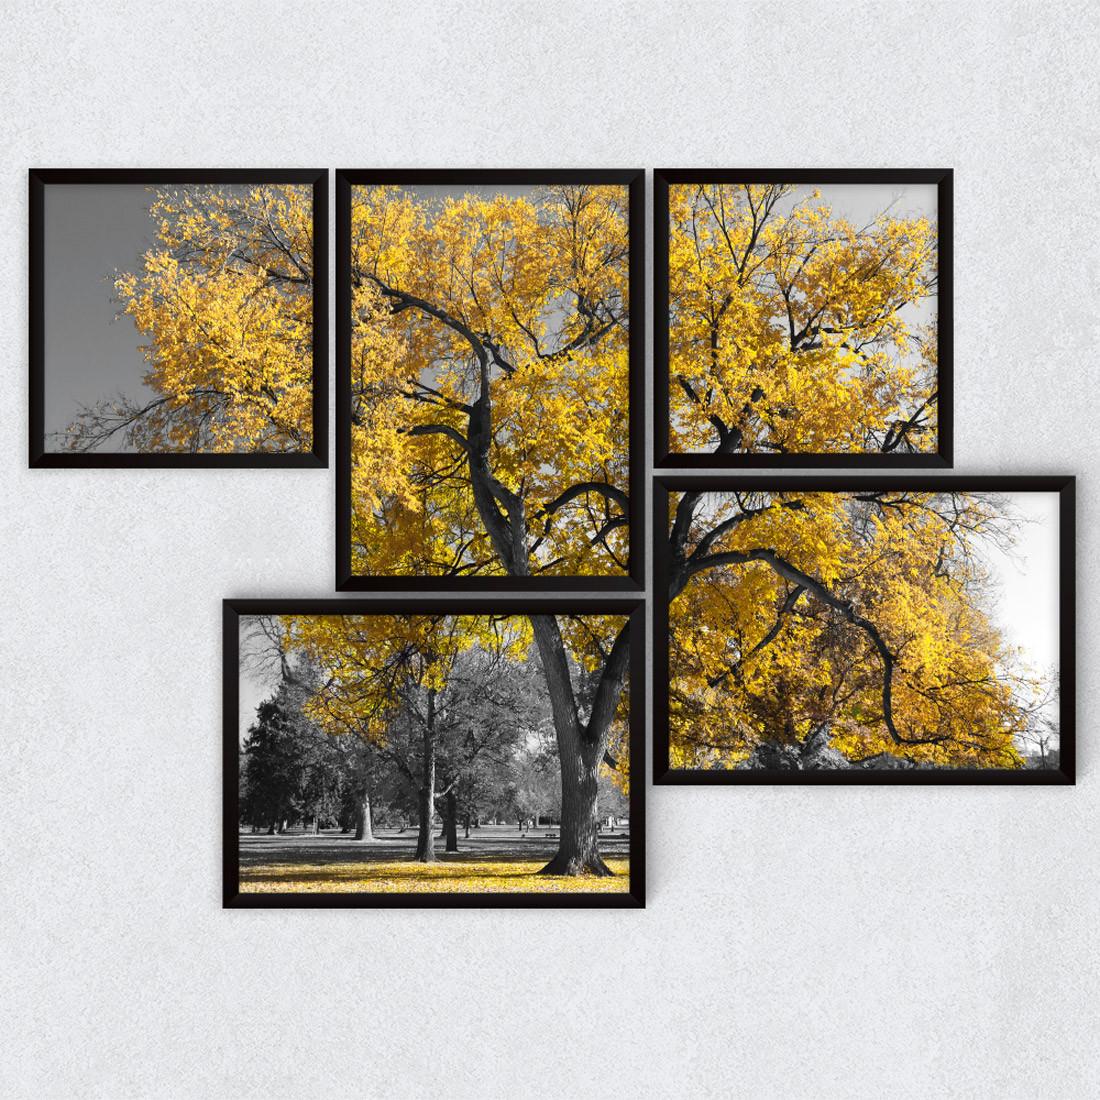 Conjuntos de Quadros Decorativos Árvore Amarela